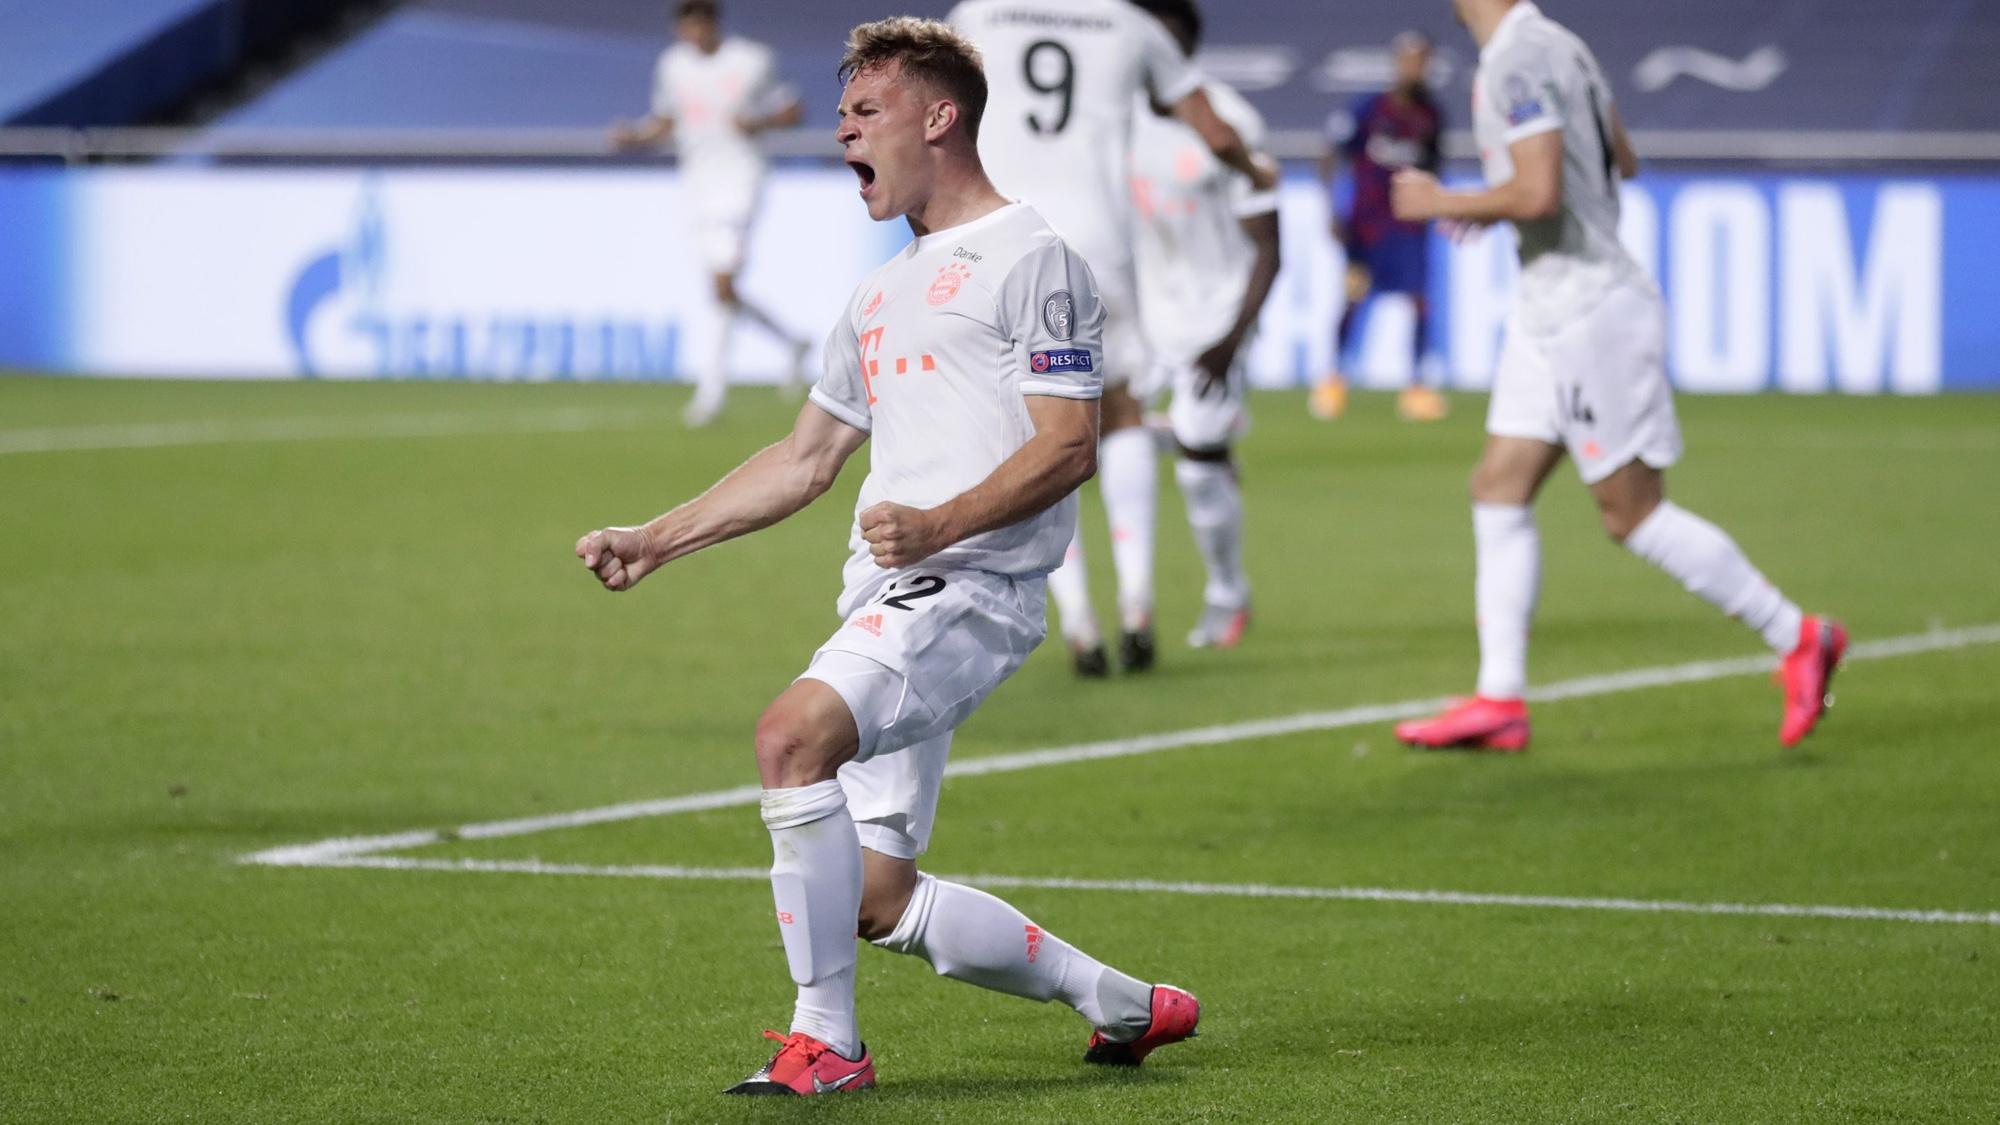 Lyon Vs Bayern Munich Live Stream Where To Watch Champions League Semifinals Tom S Guide